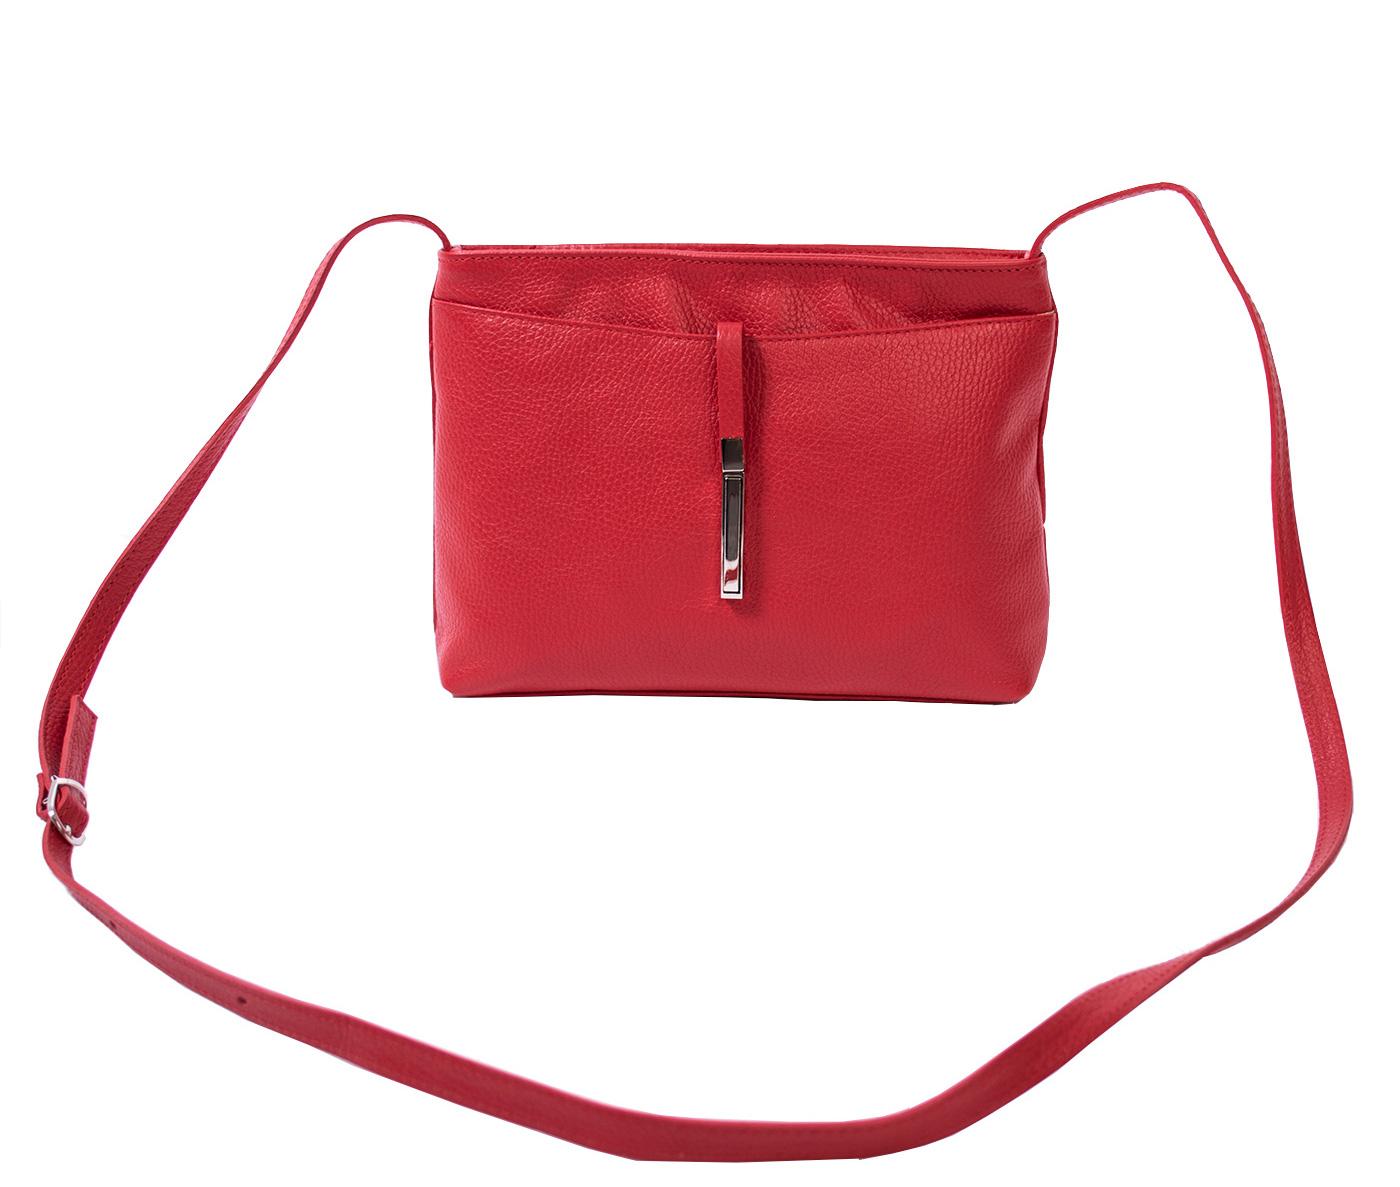 Bags and more Rita Piros Női Bőr Oldaltáska